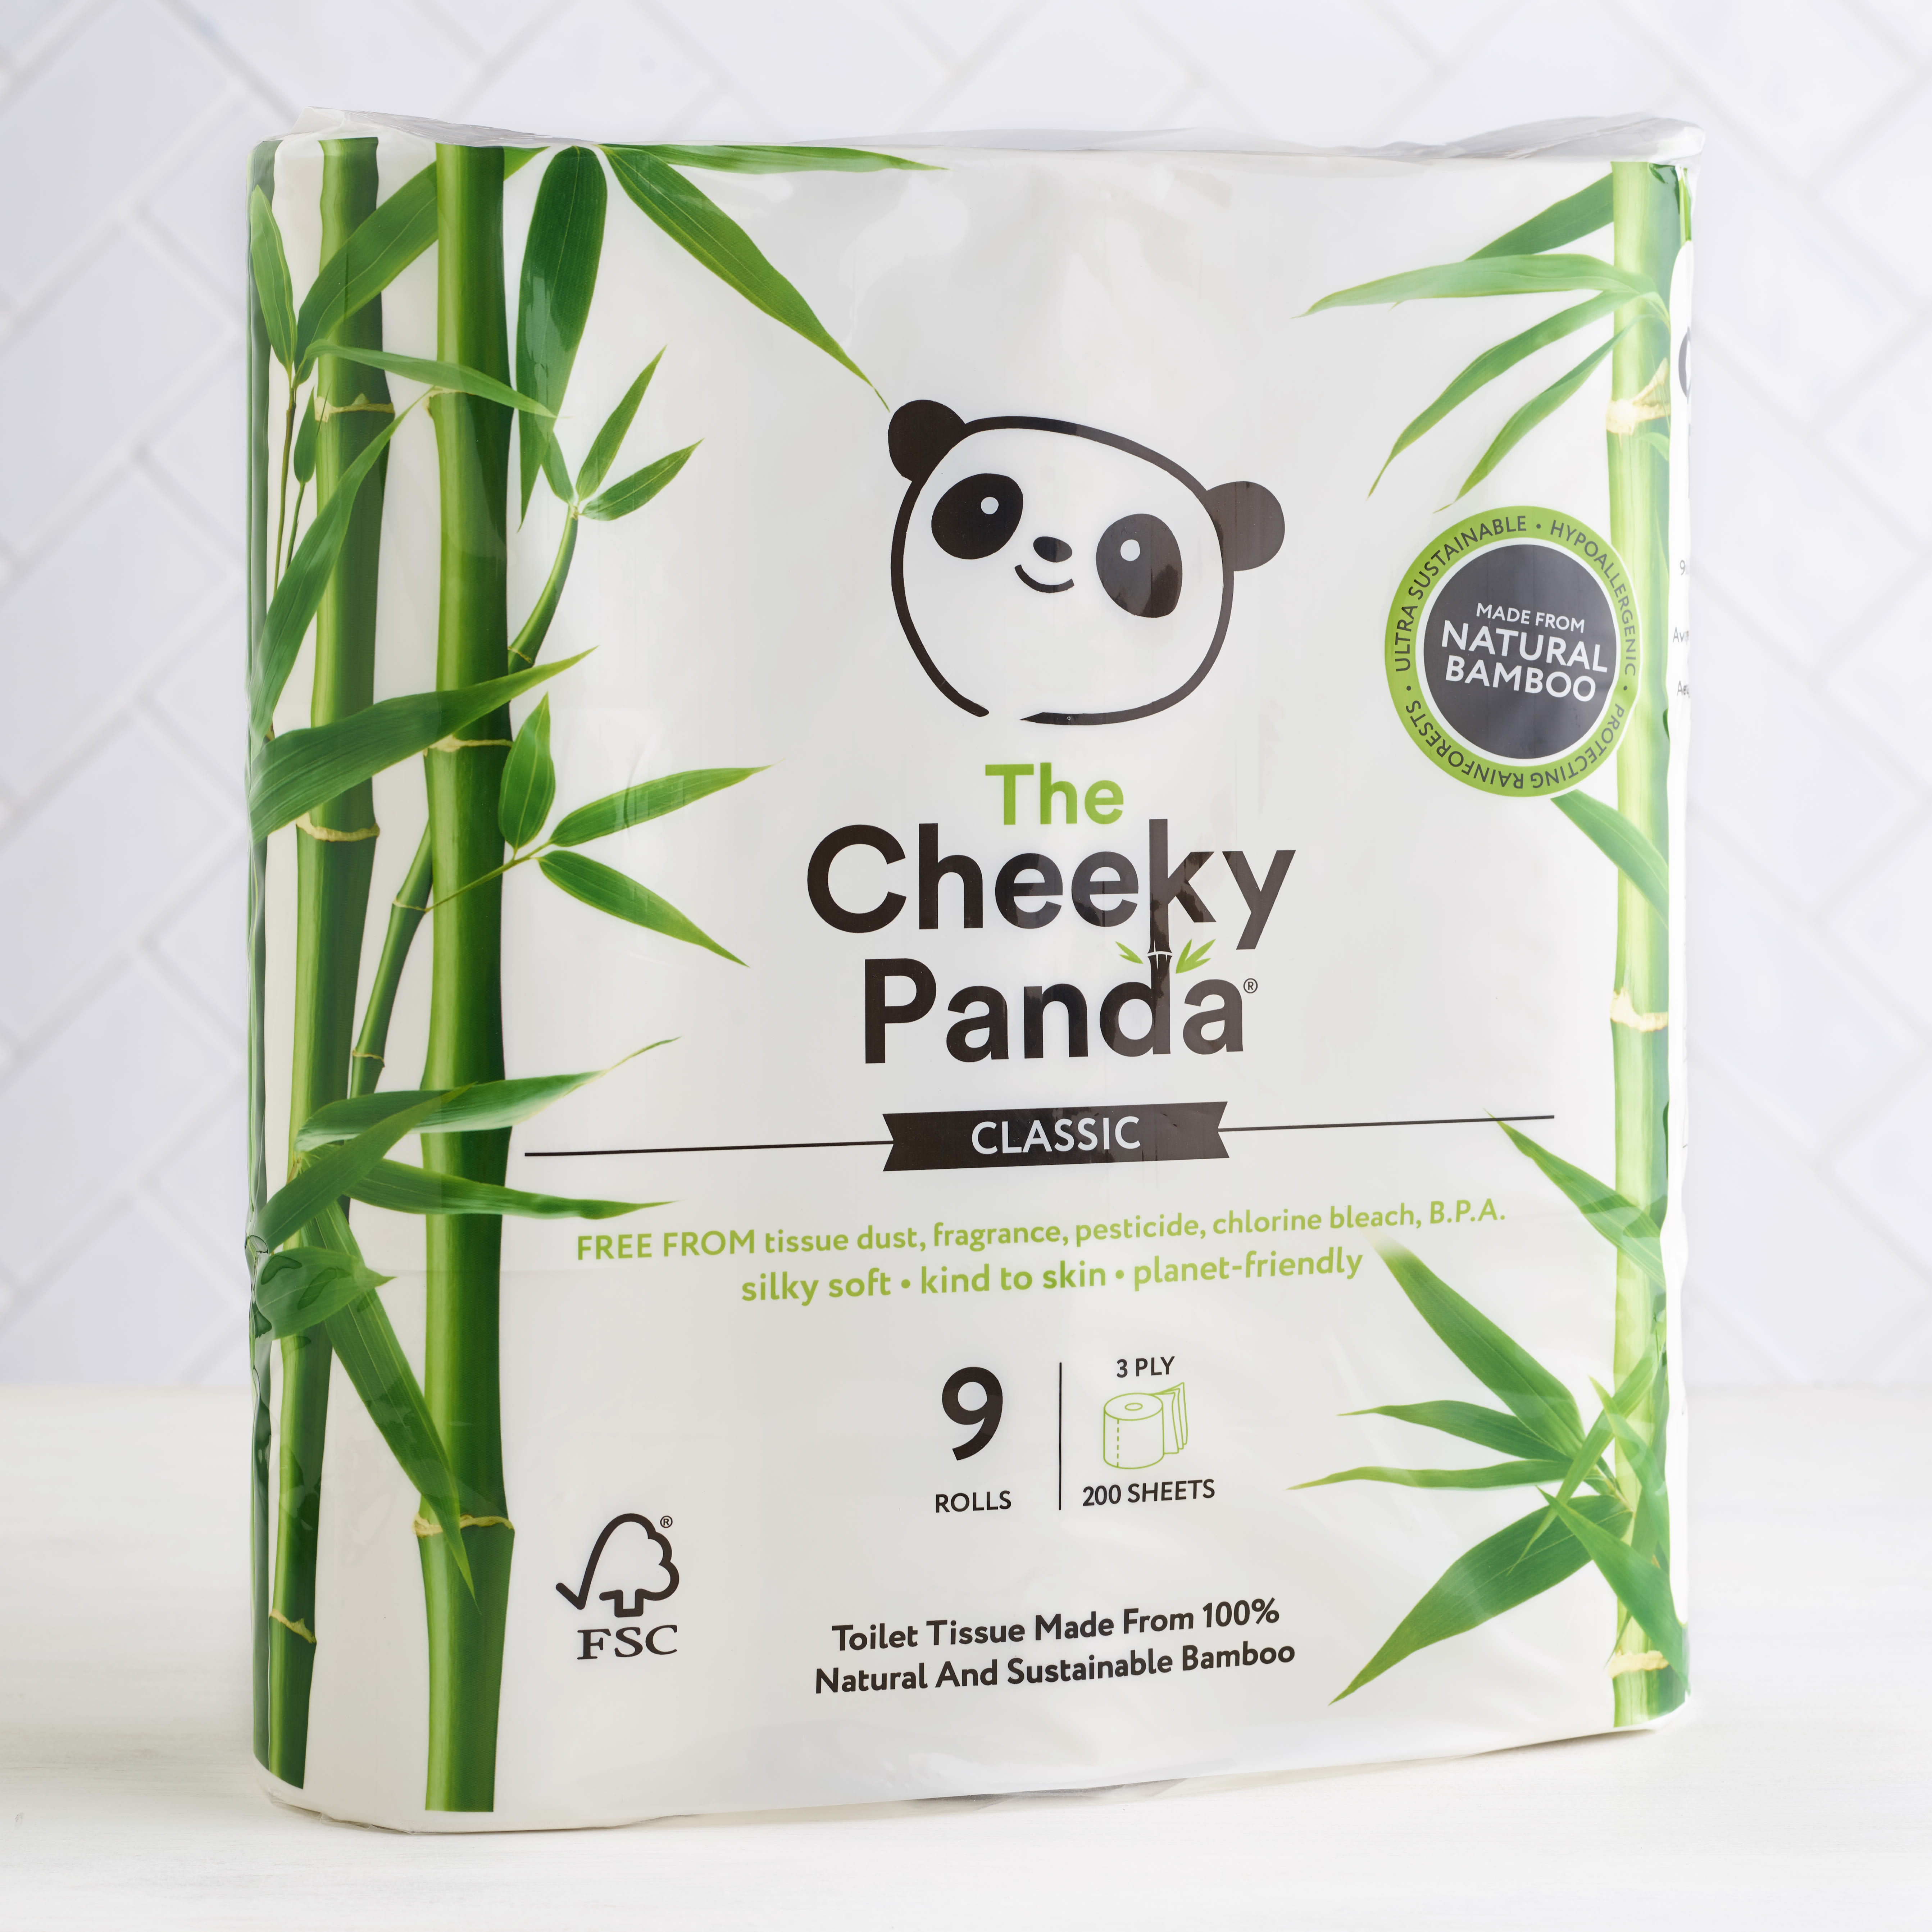 The Cheeky Panda Plastic free Toilet Rolls, 9 Pack